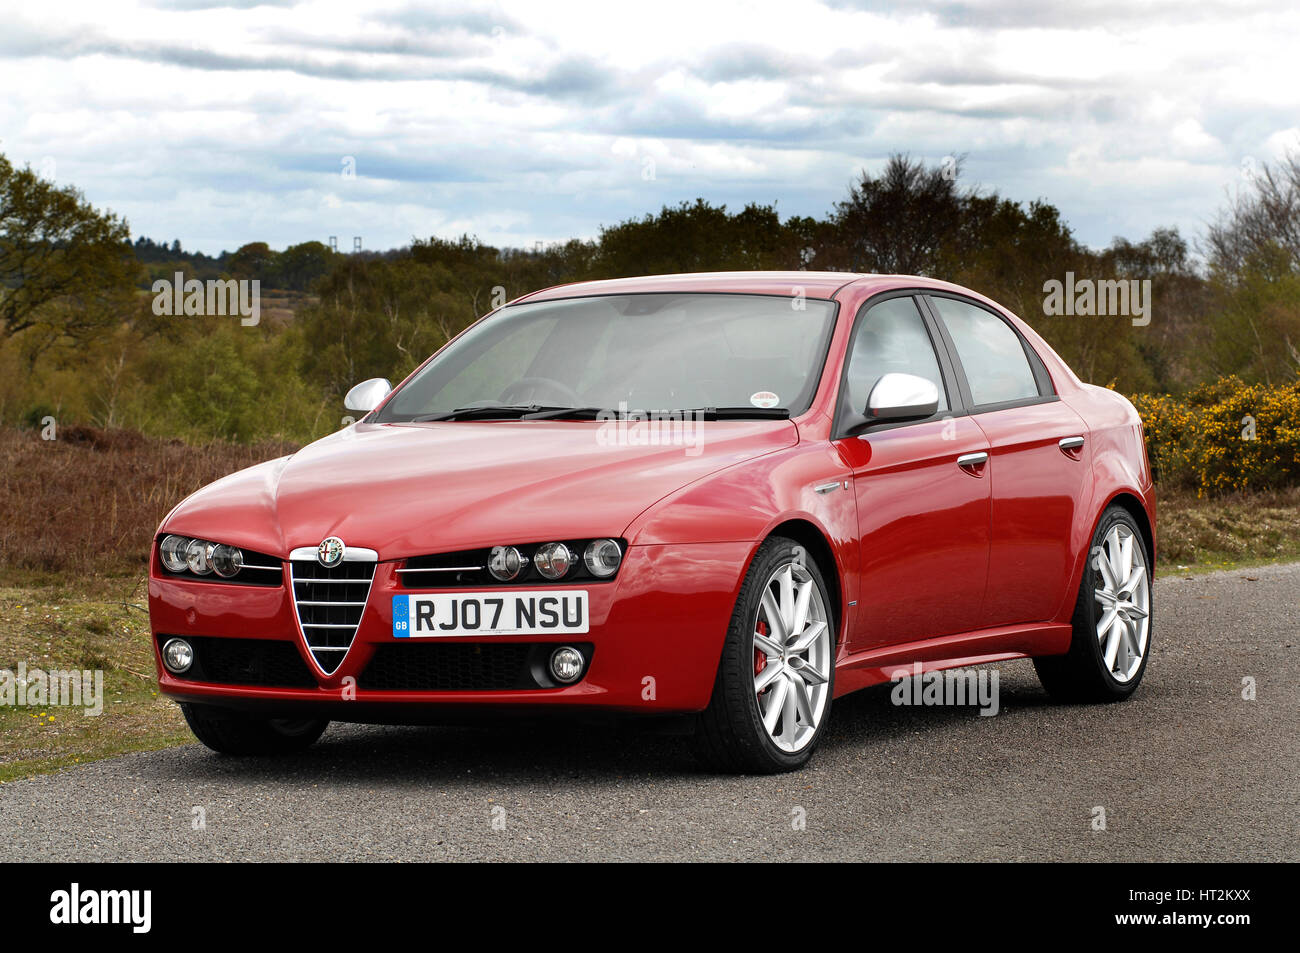 2007-Alfa Romeo 159. Künstler: unbekannt. Stockbild